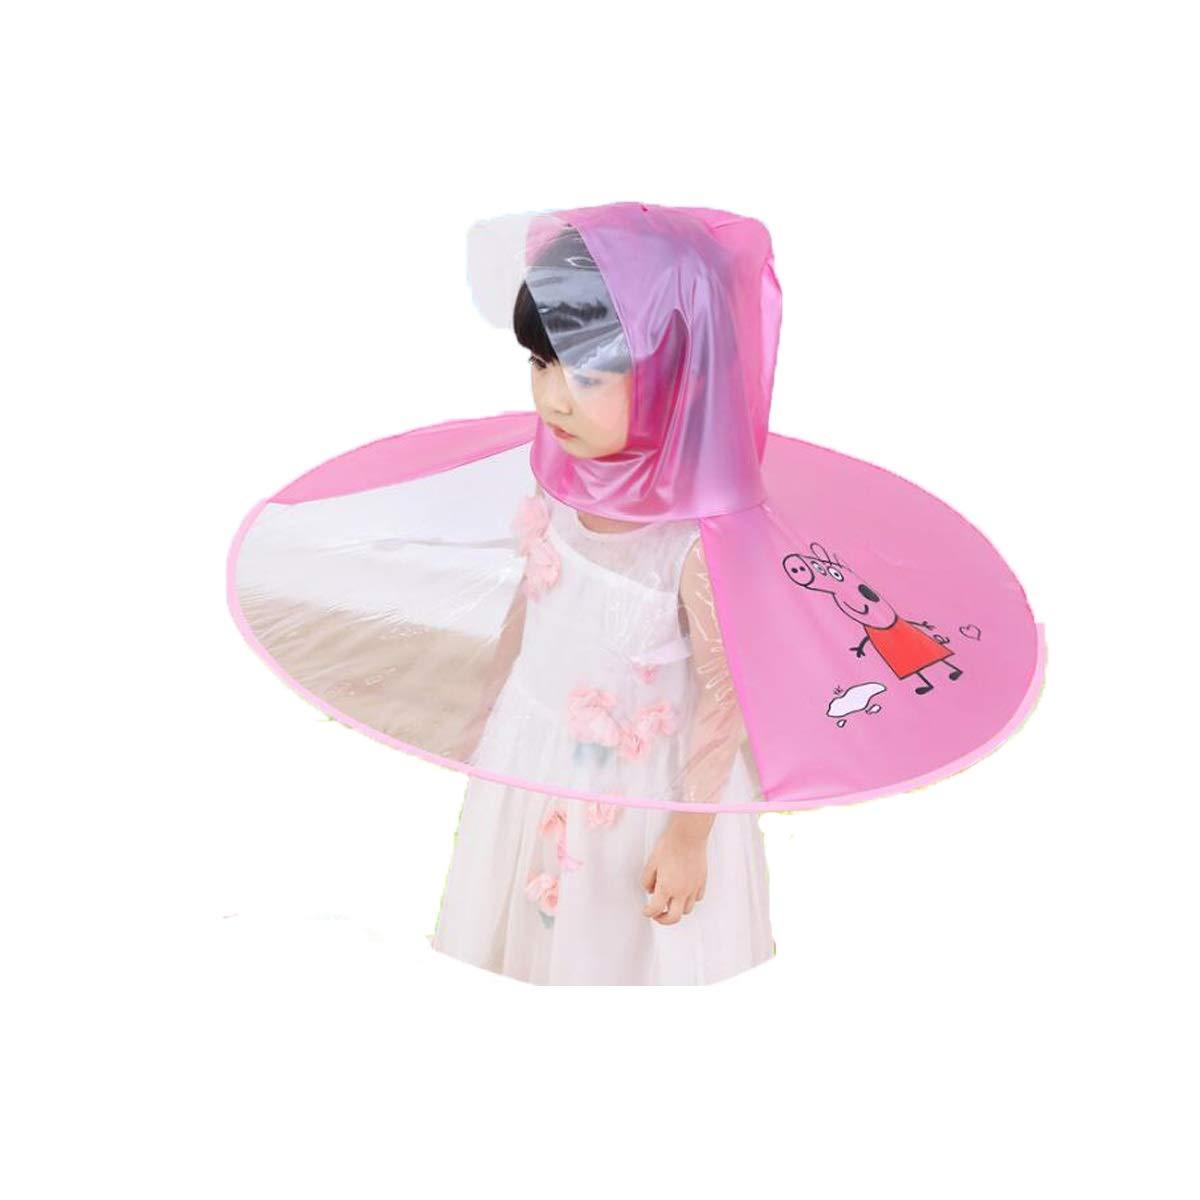 TONGBOSHI Little Yellow Duck Raincoat, Flying Saucer Raincoat, Folding Piglet Net Red Boy Girl Cloak, Net Red Raincoat, Blue Piglet, Suitable for Height 80-130cm (Color : Pink)